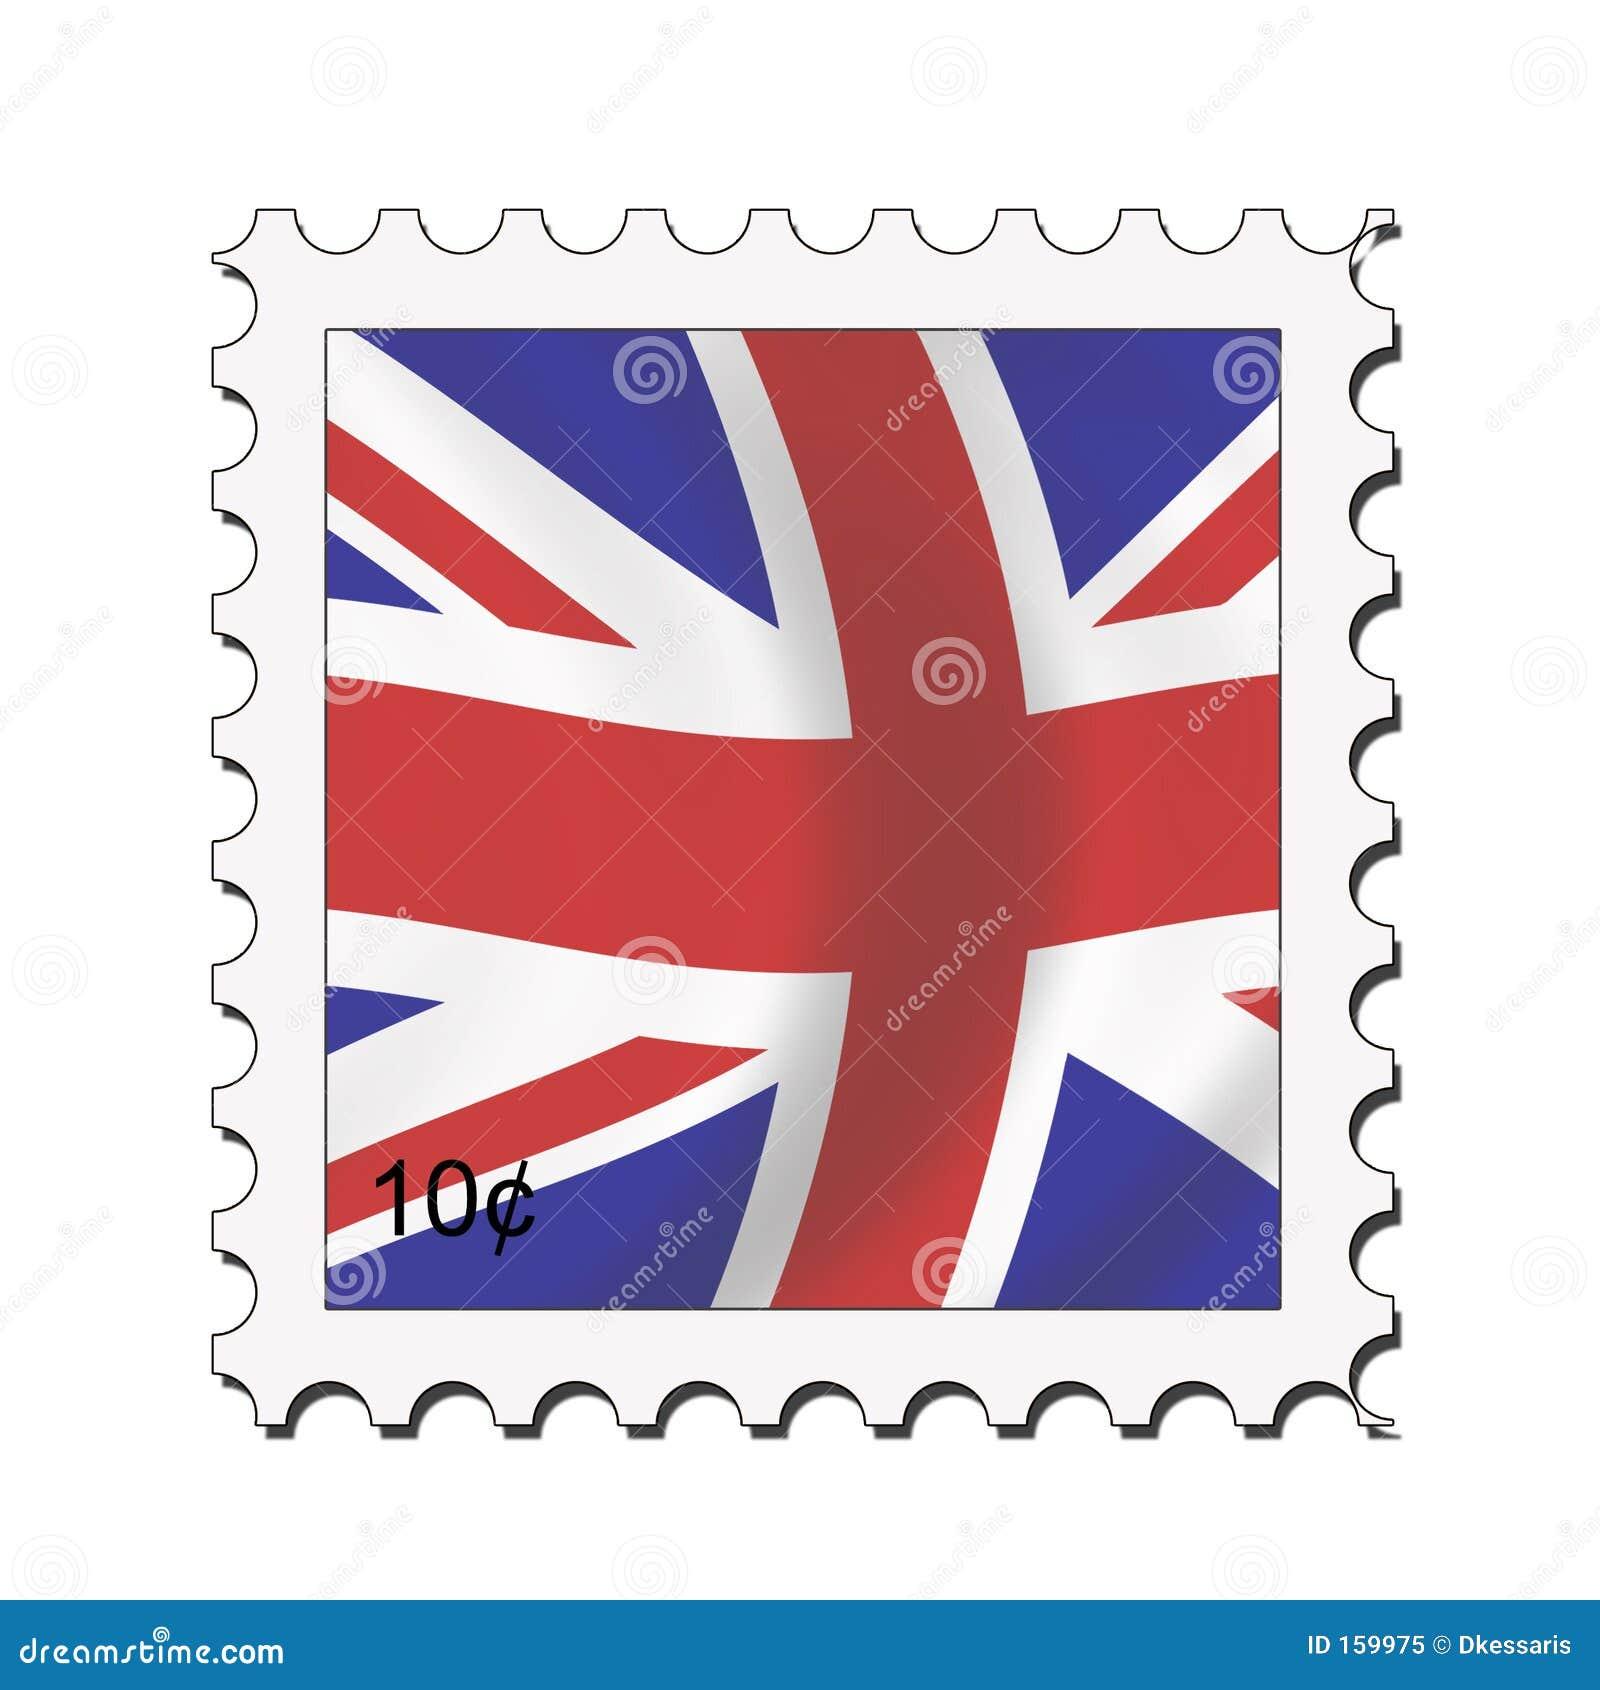 Union Jack Stamp Royalty Free Stock Photo